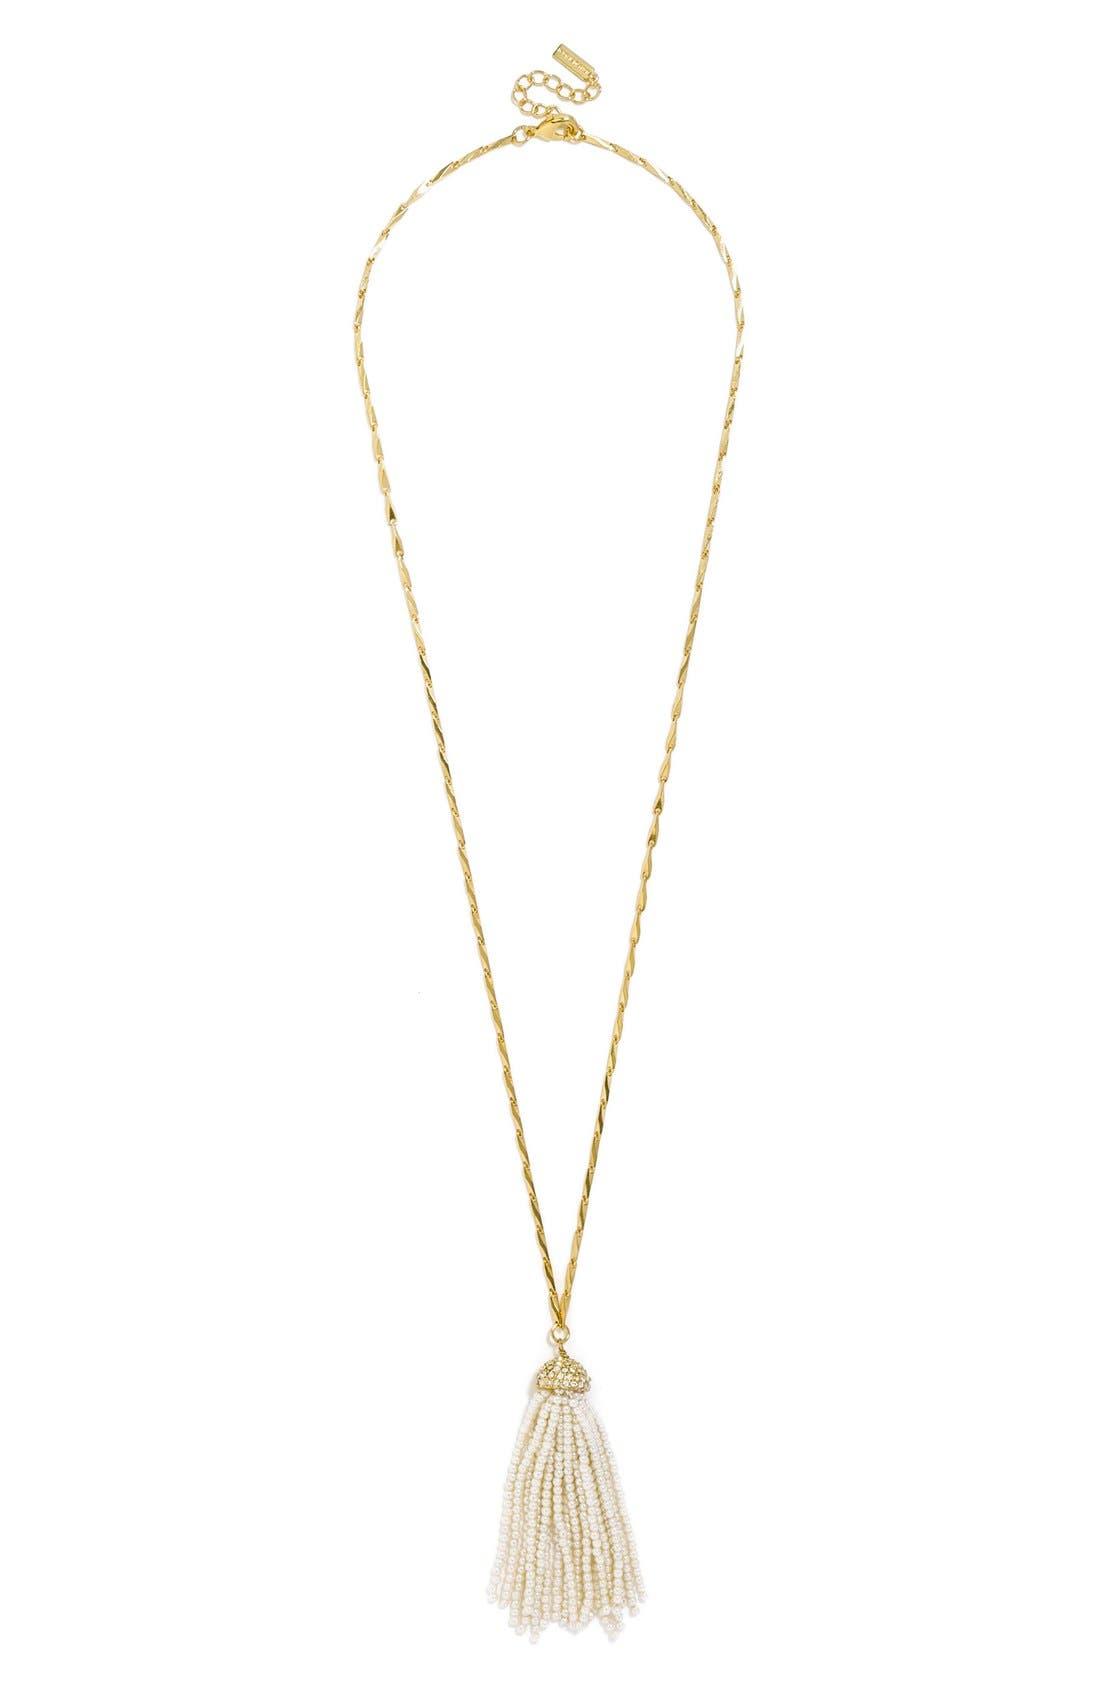 Alternate Image 1 Selected - BaubleBar Mini Faux Pearl Tassel Pendant Necklace